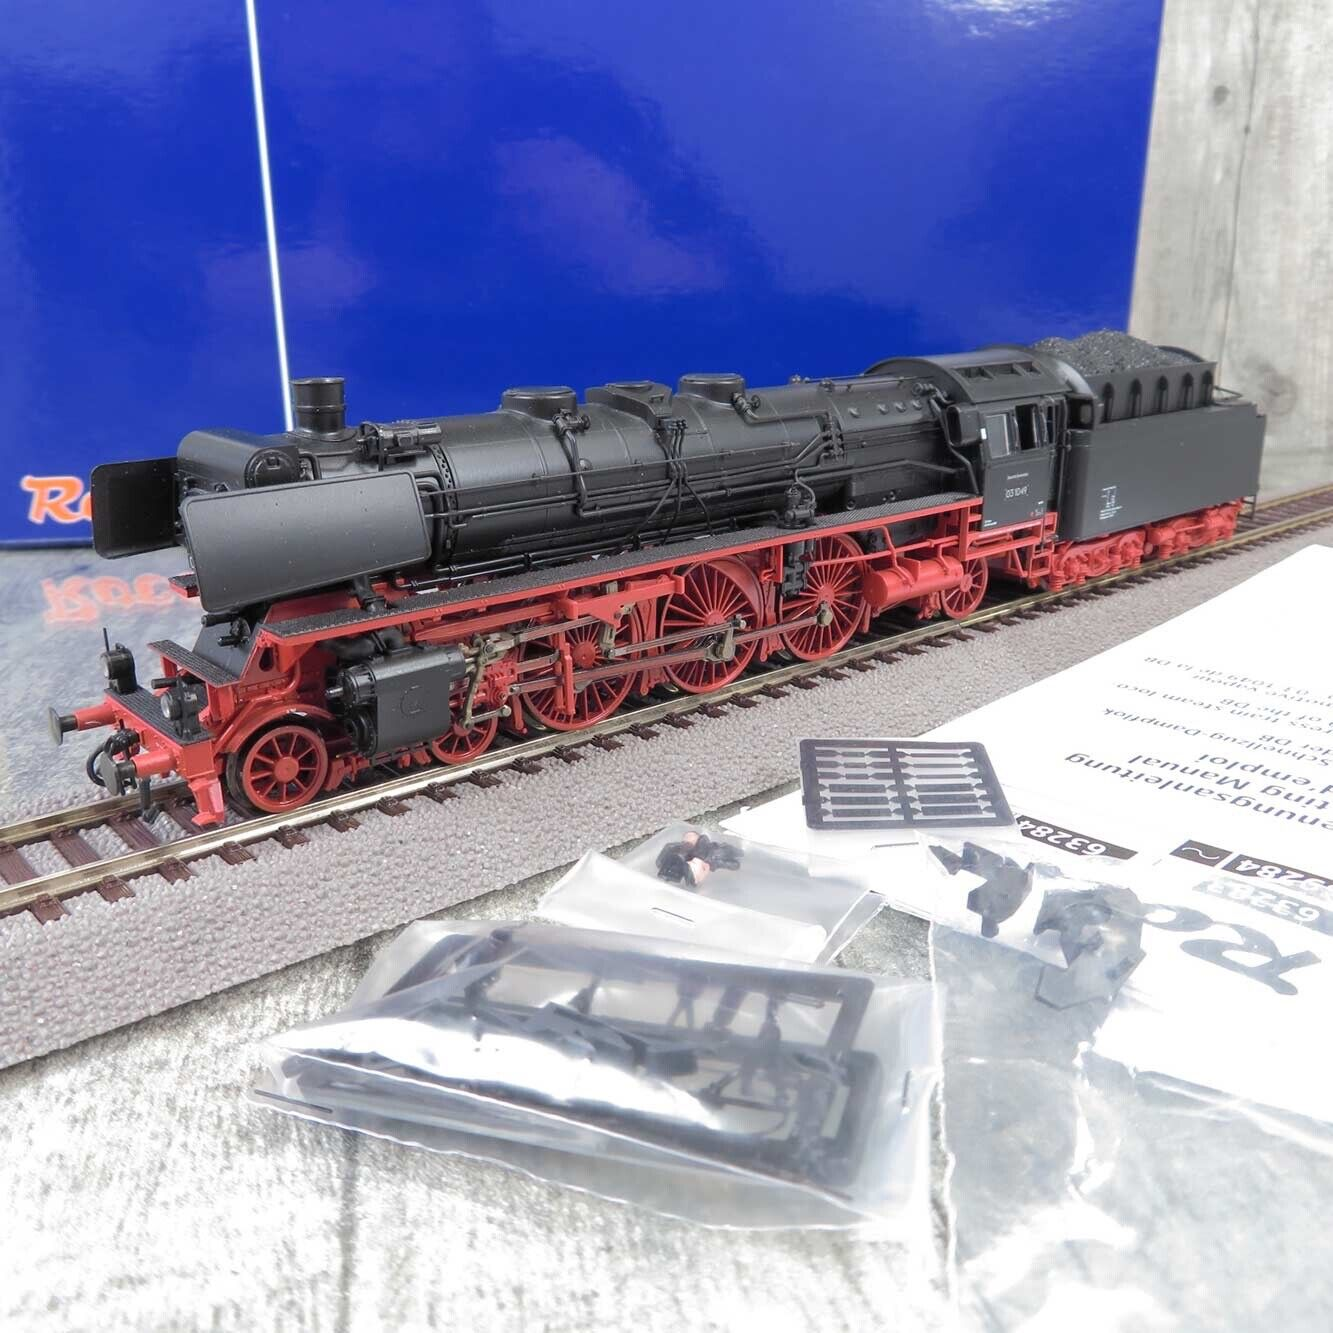 ROCO 63283 - H0 - Dampflok - DB 03 1049 - Digital - OVP -  O20442